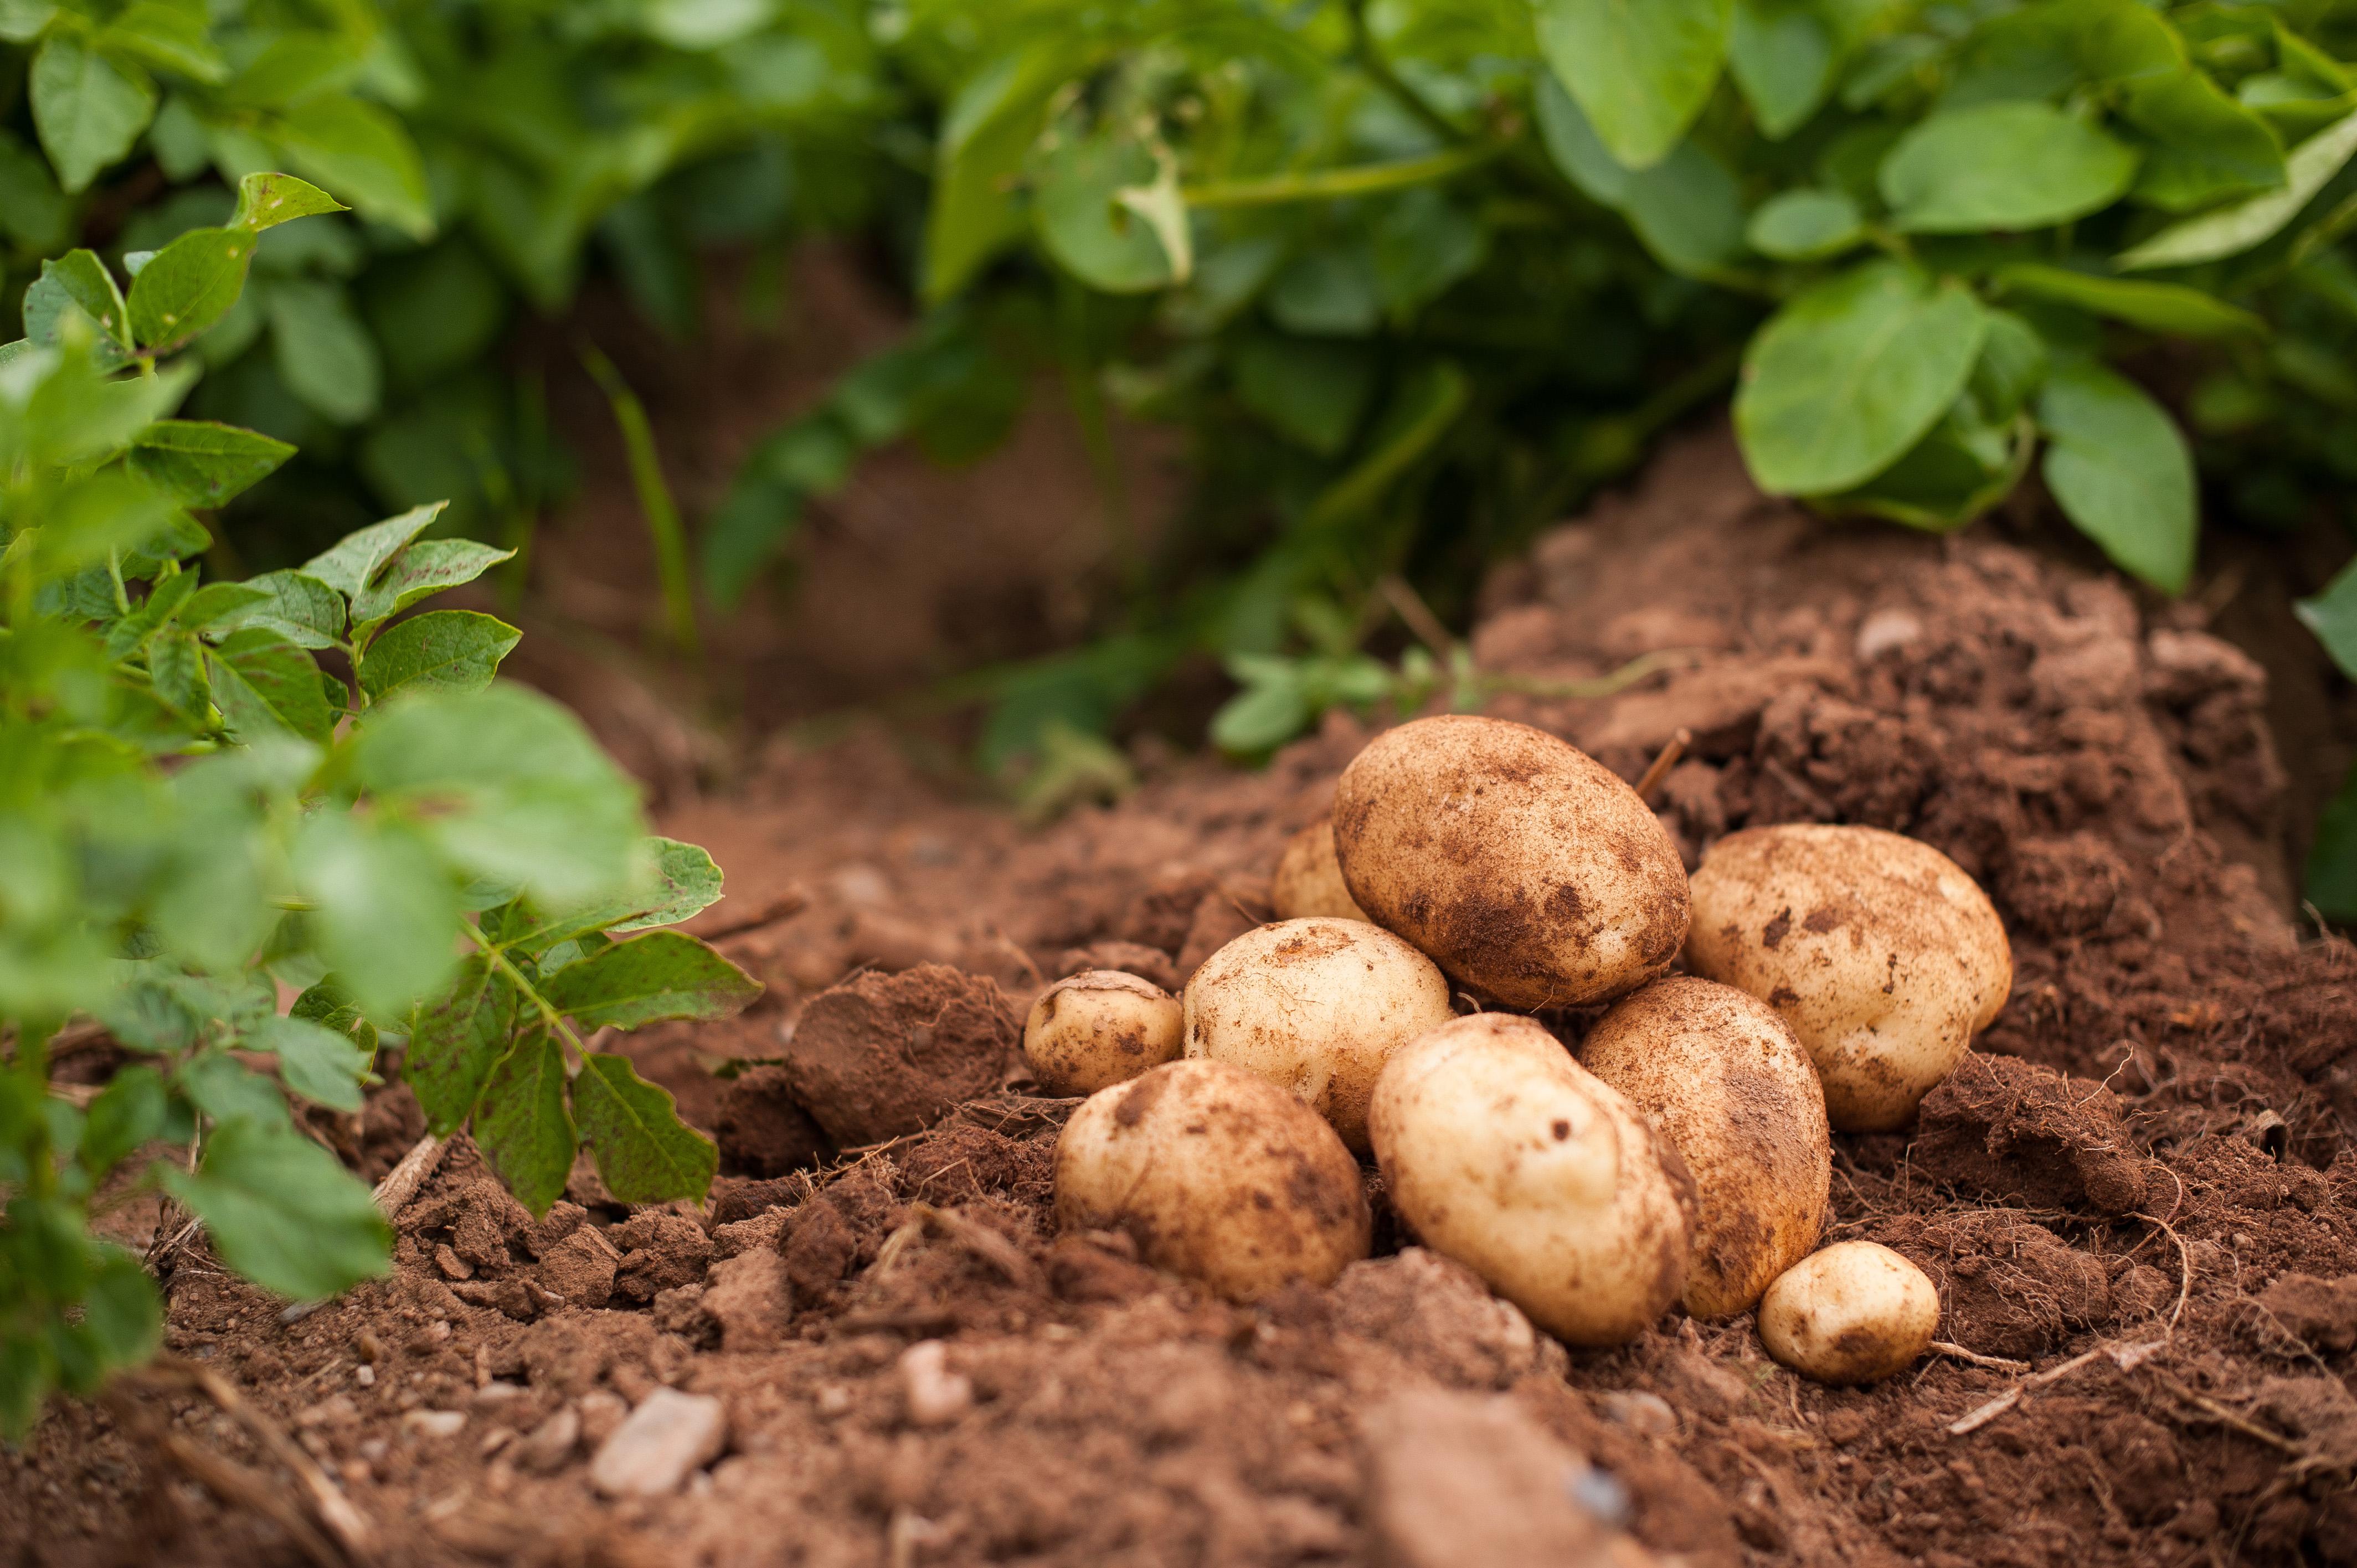 Country Magic New White Potatoes freshly dug potatoes in field